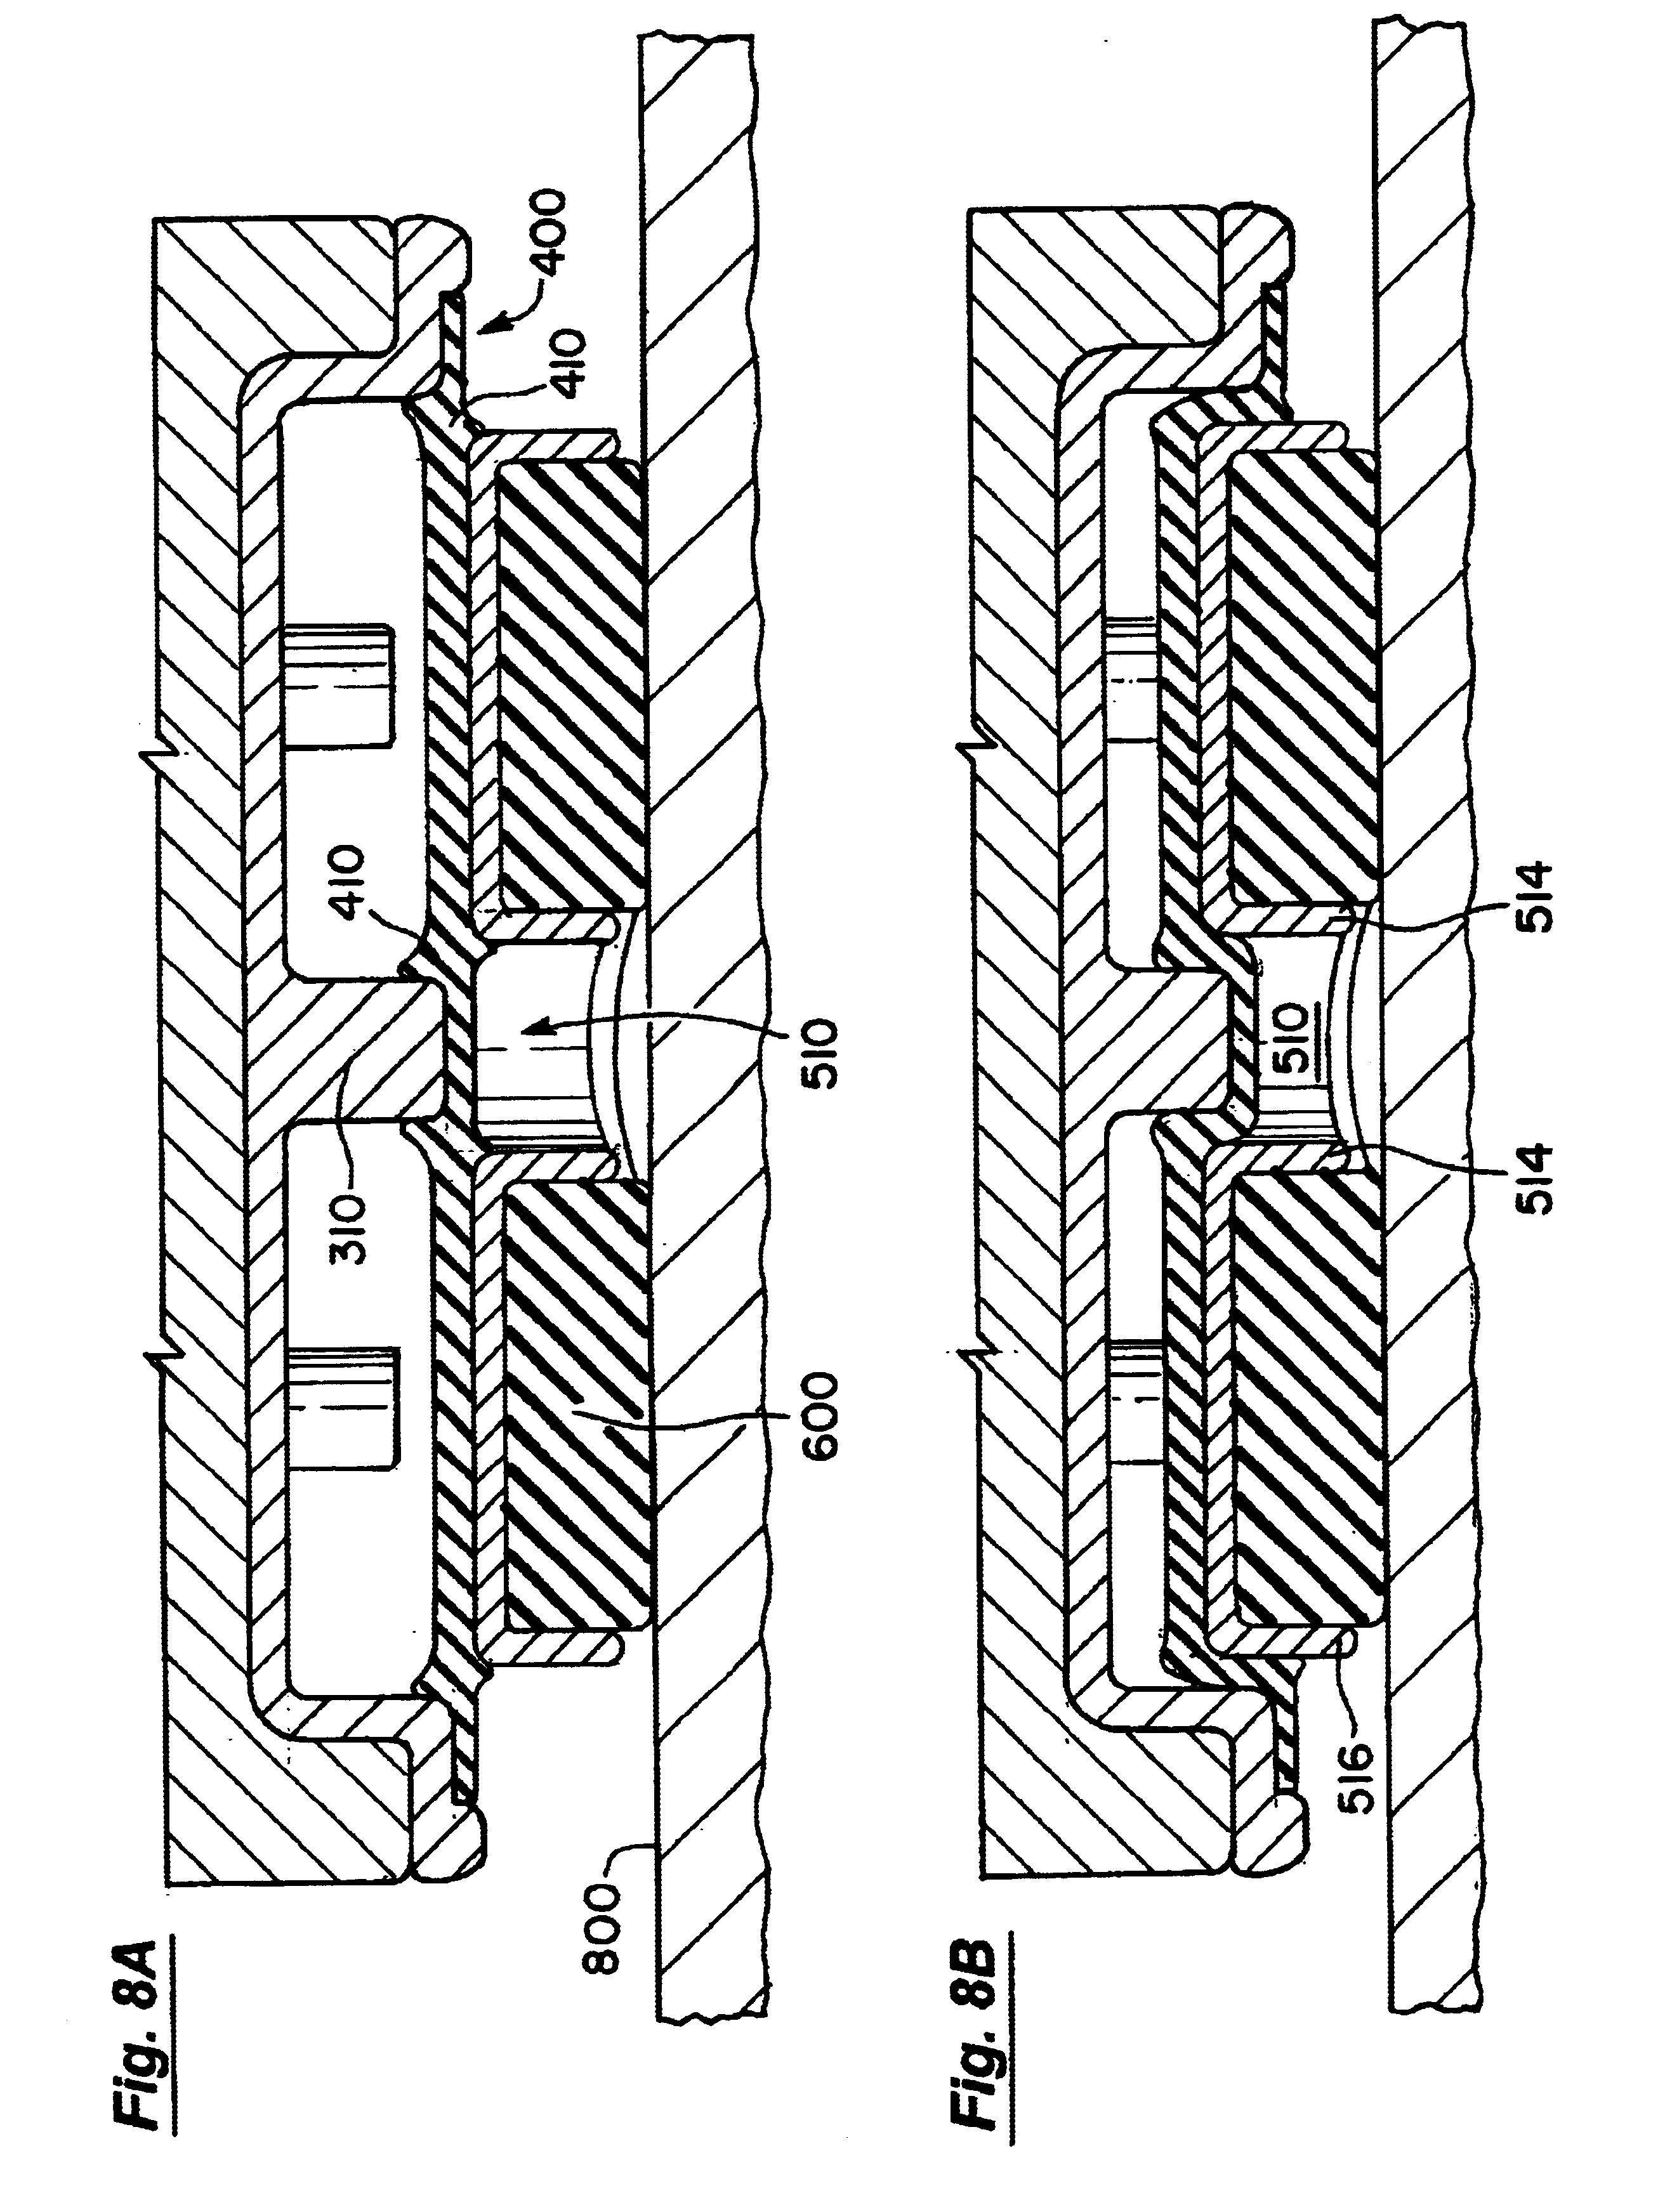 mtx box wiring diagram databasehonda mtx 50 wiring diagram wiring diagram sierramichelsslettvet honda mtx wiring diagram car fuse box